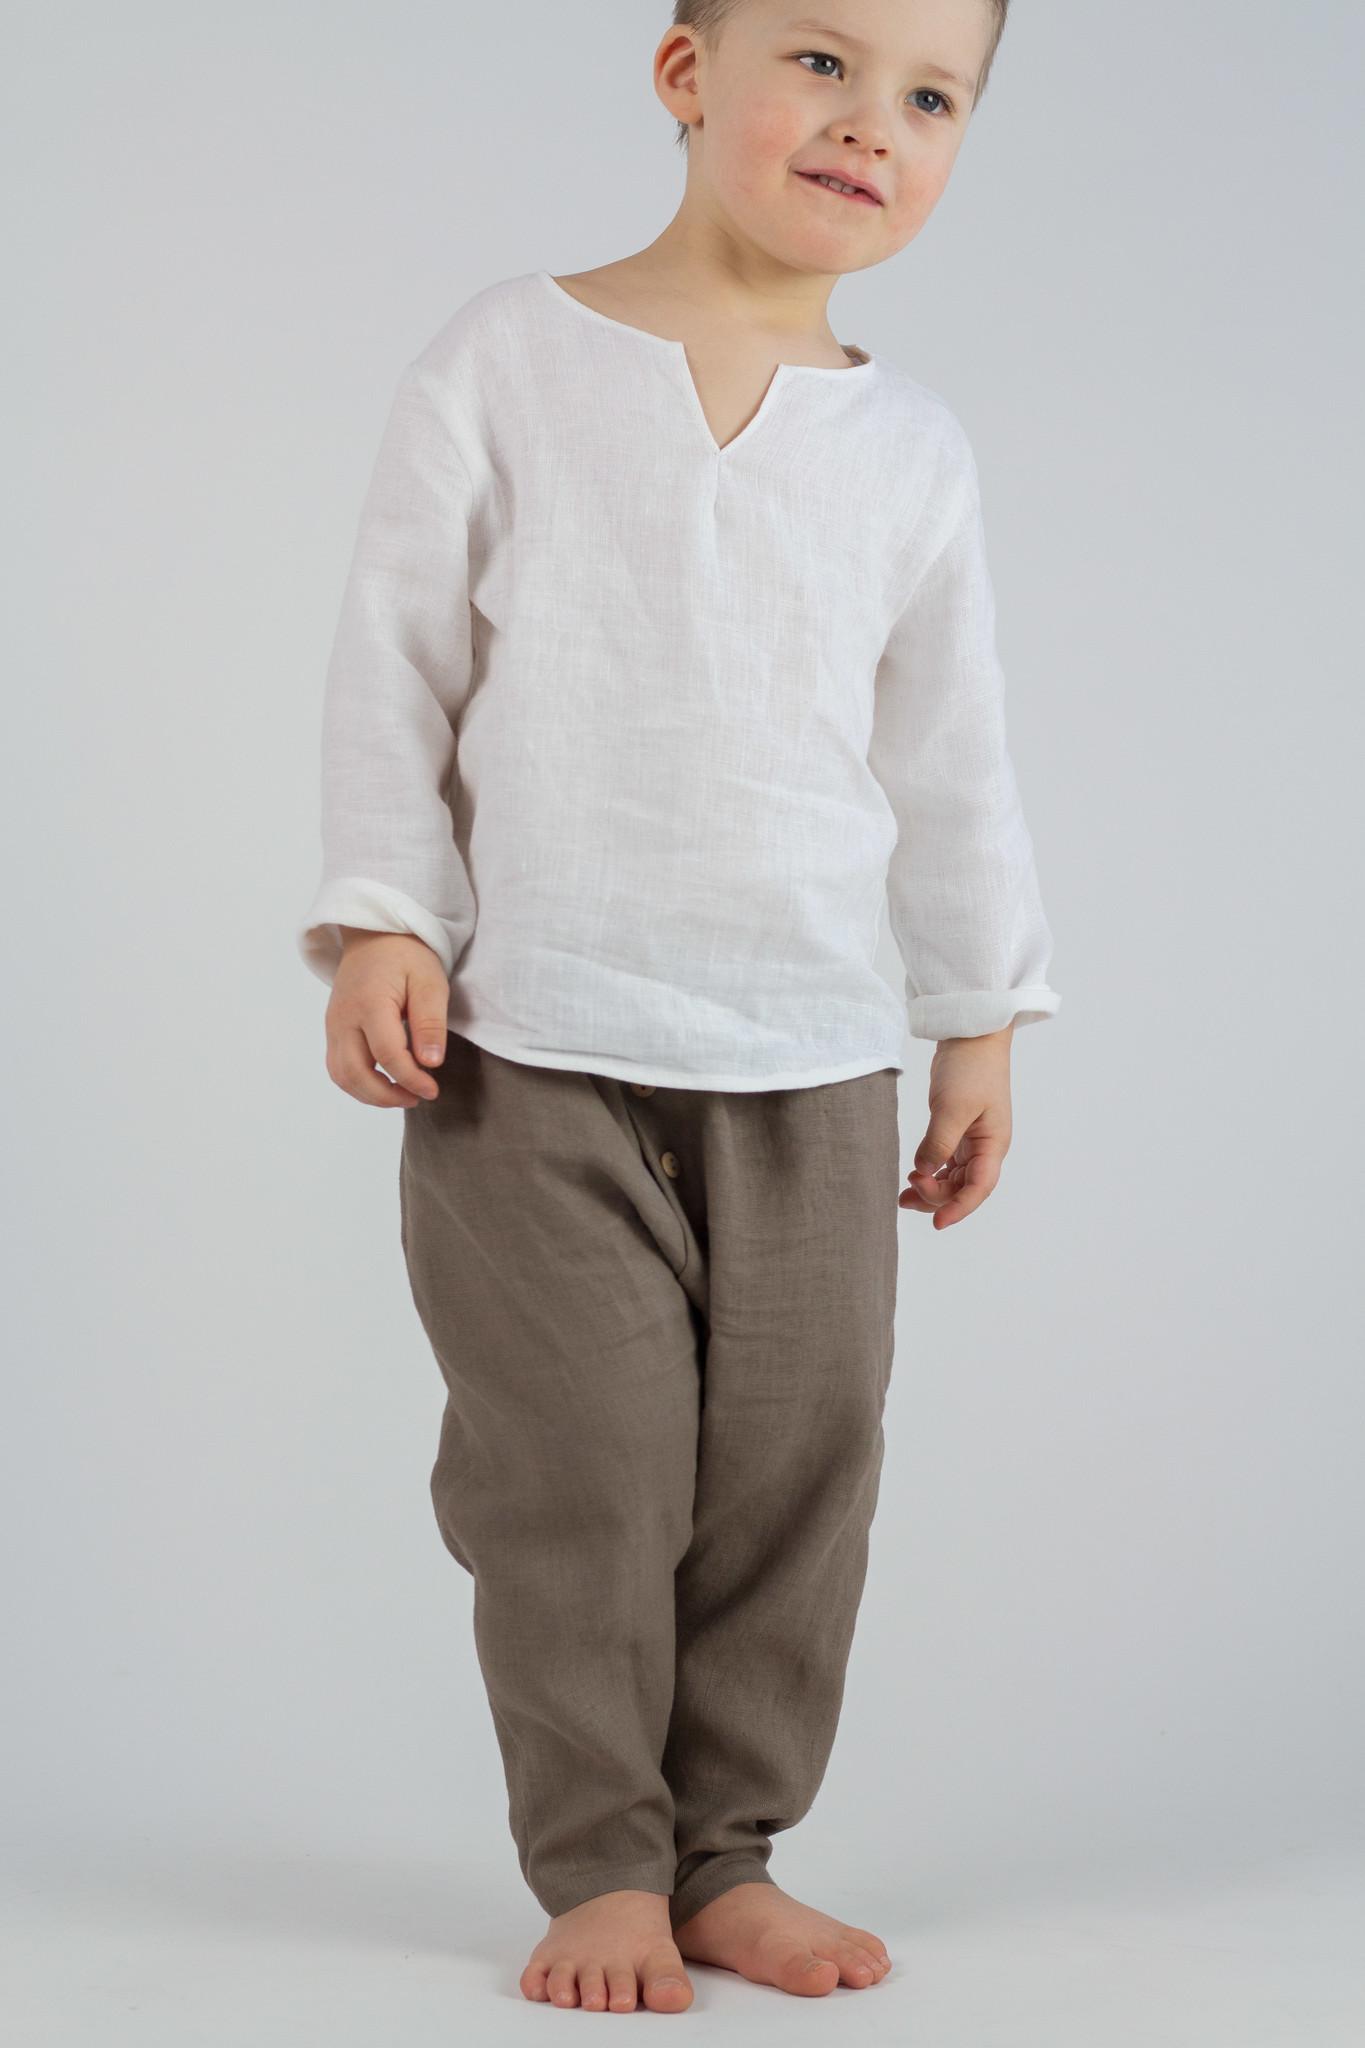 Kinder Leinenhose khakifarben